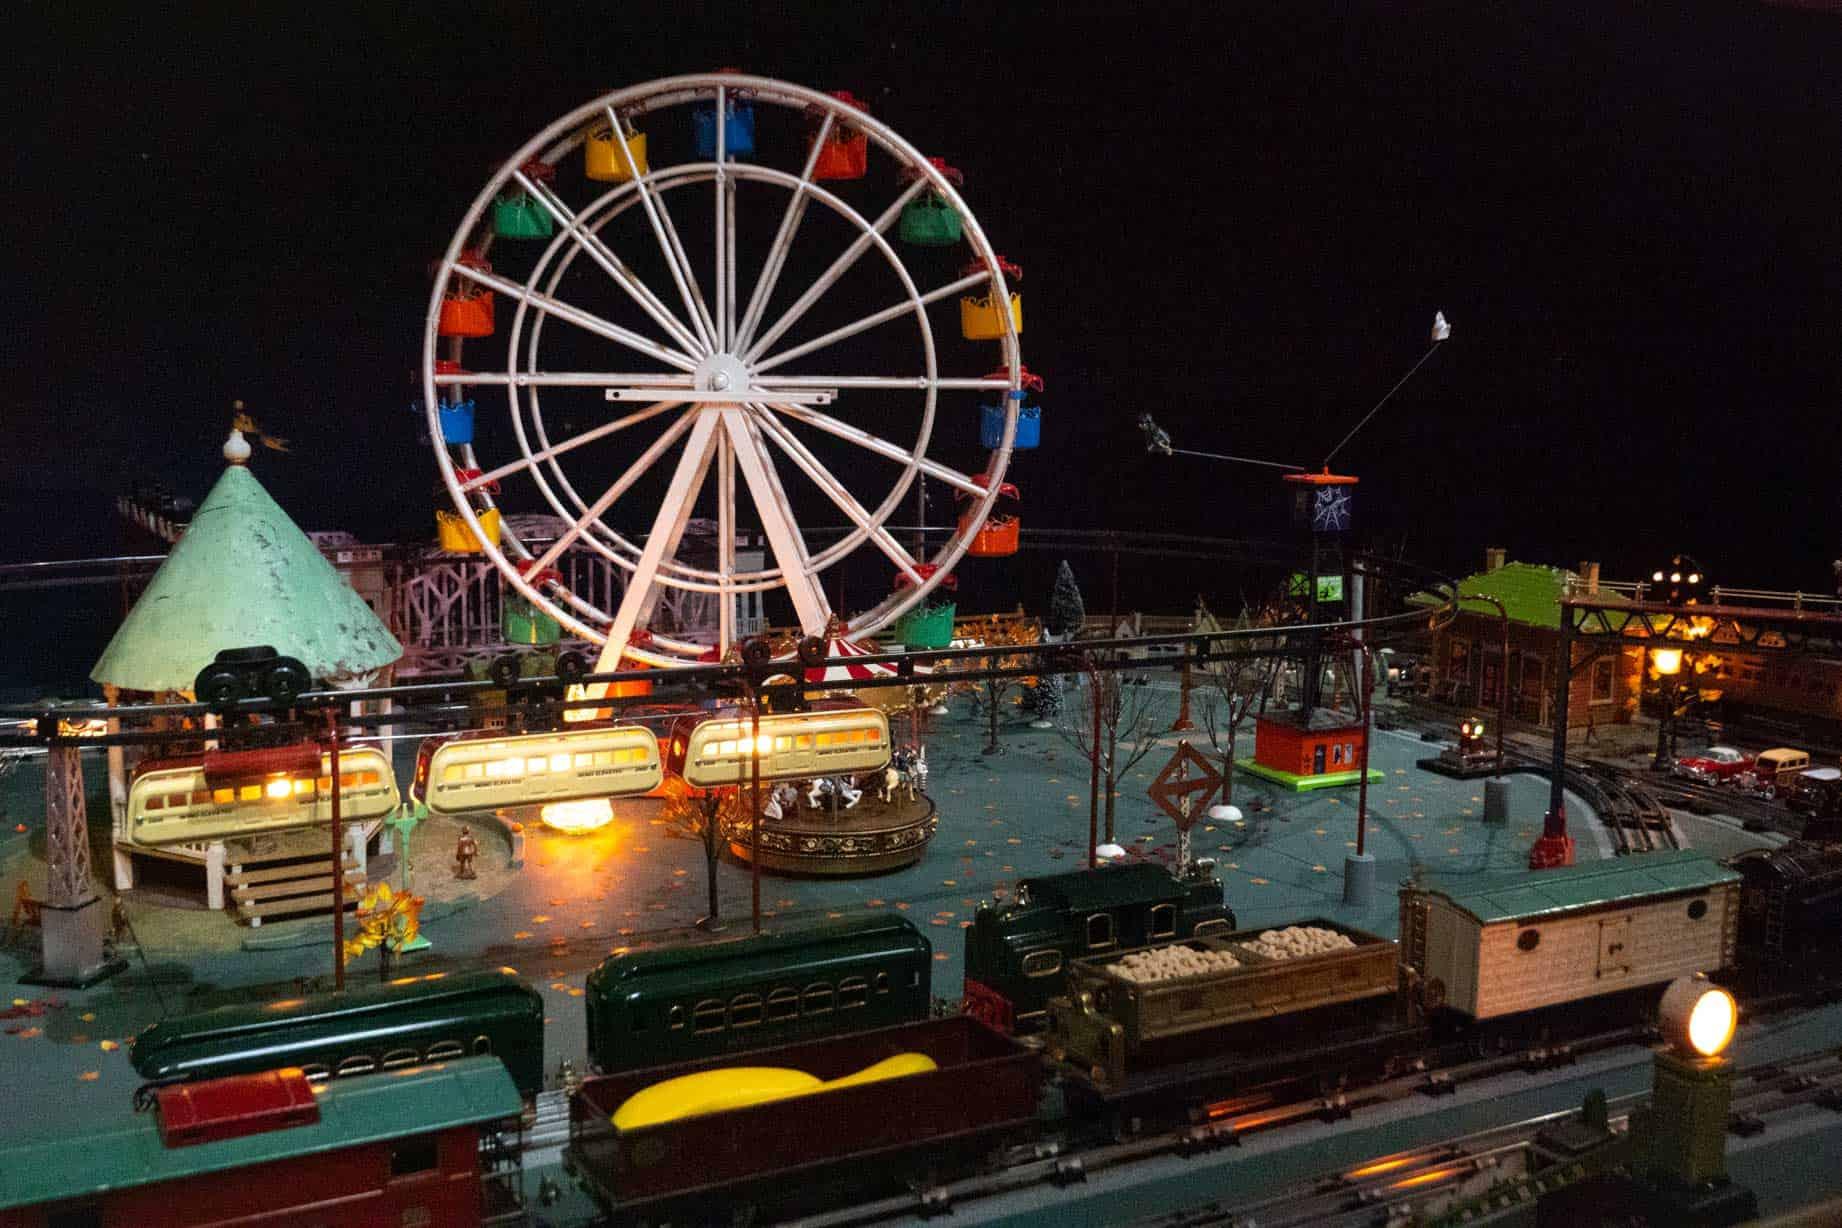 Miniature train circling a carnival scene